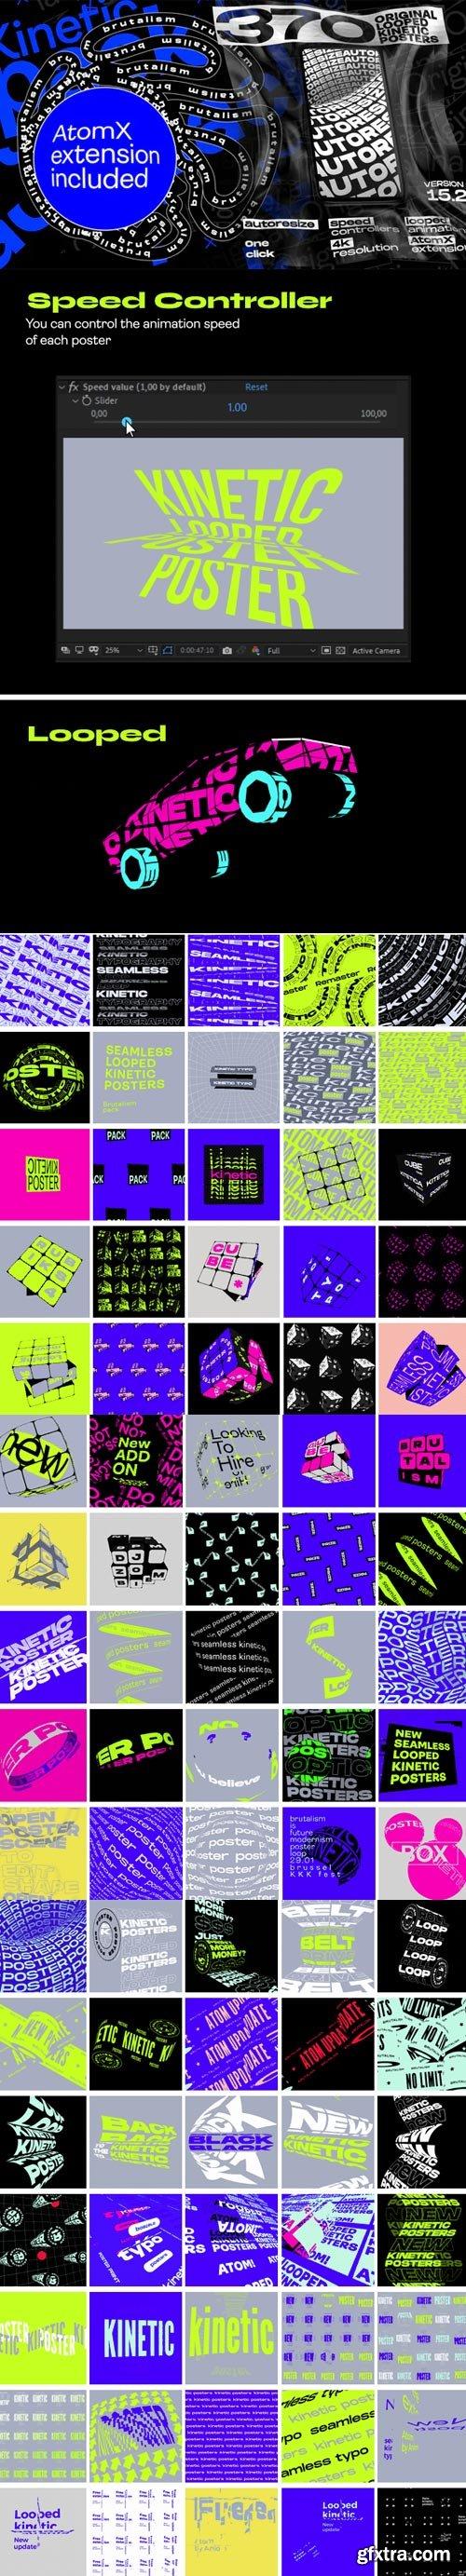 Videohive - Seamless Loop Kinetic Posters V15.1 - 24684532